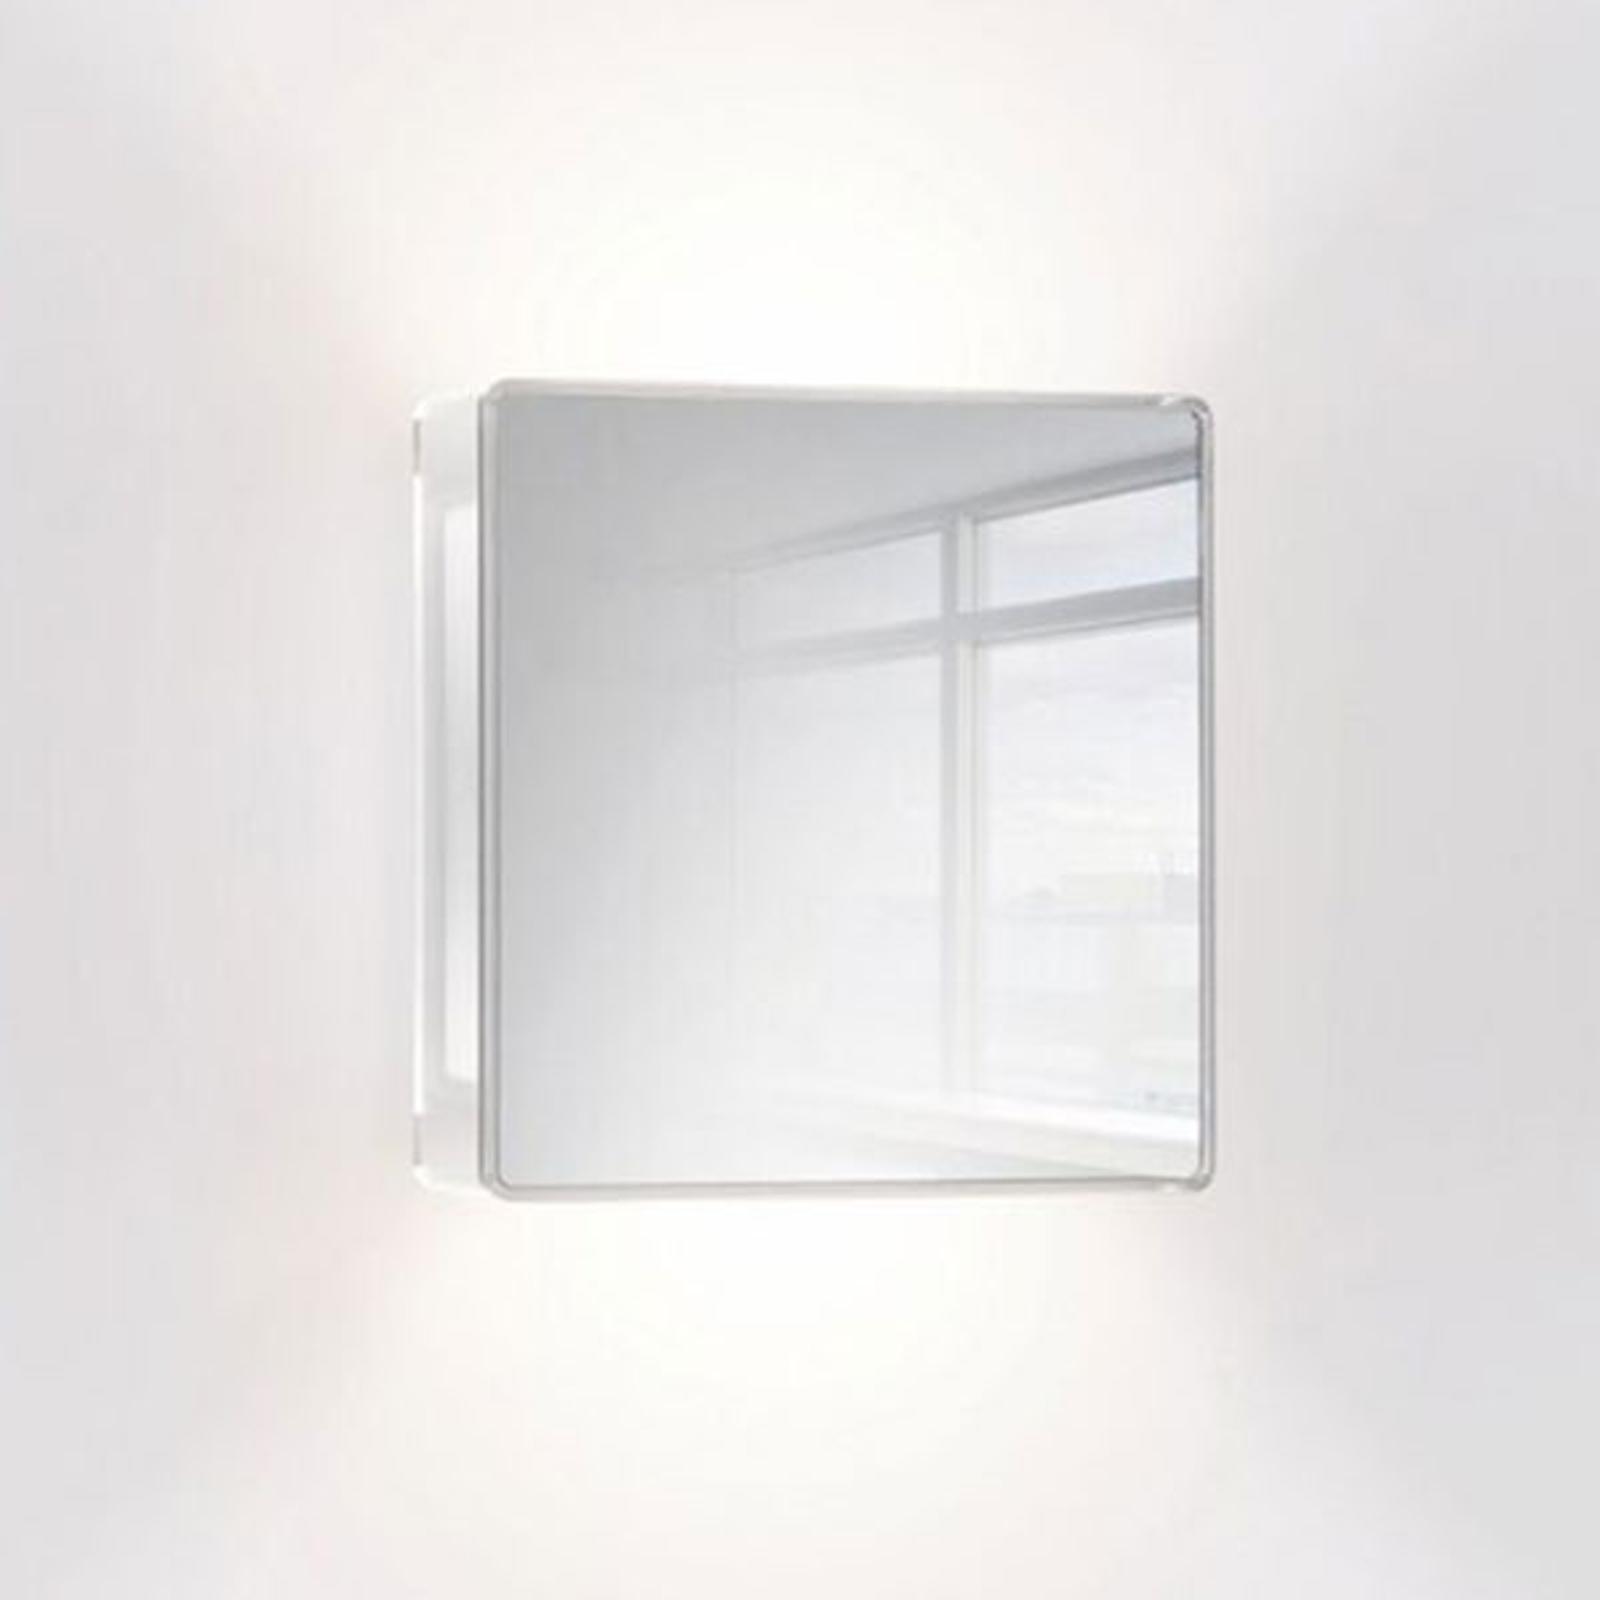 serien.lighting App – LED-seinävalaisin, peili